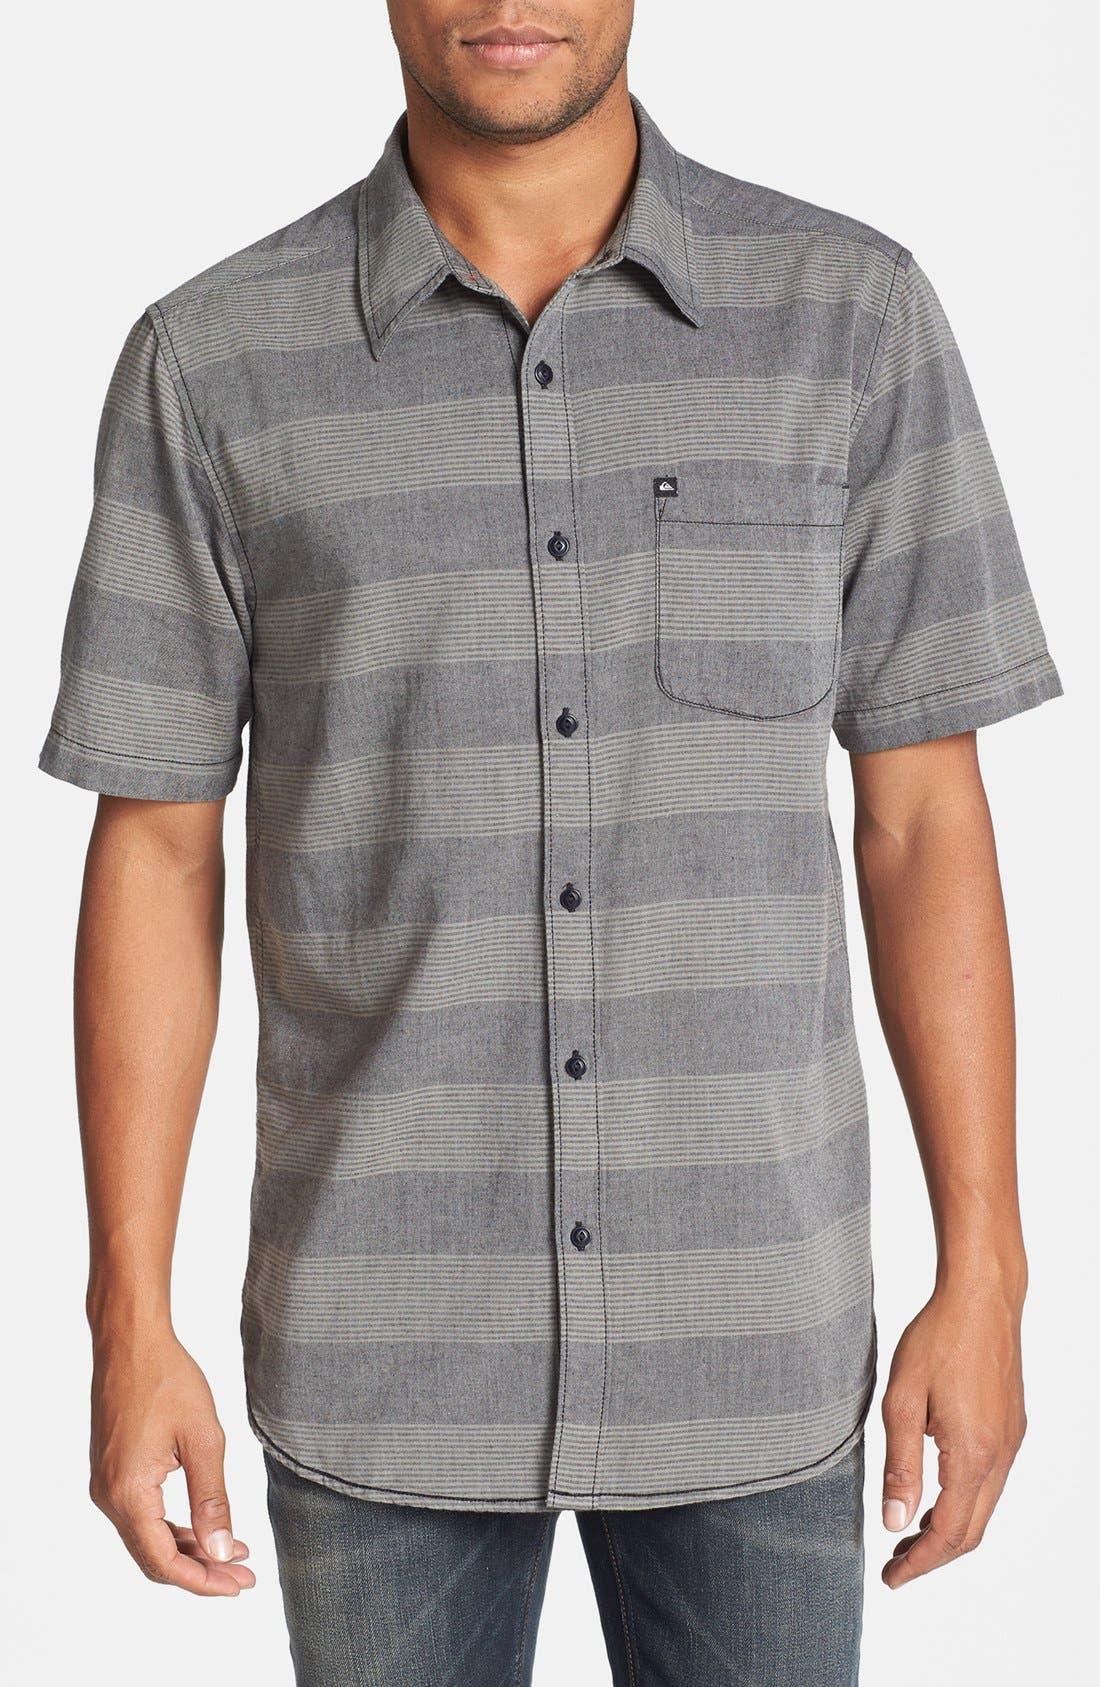 Alternate Image 1 Selected - Quiksilver 'Tube Release' Stripe Short Sleeve Shirt